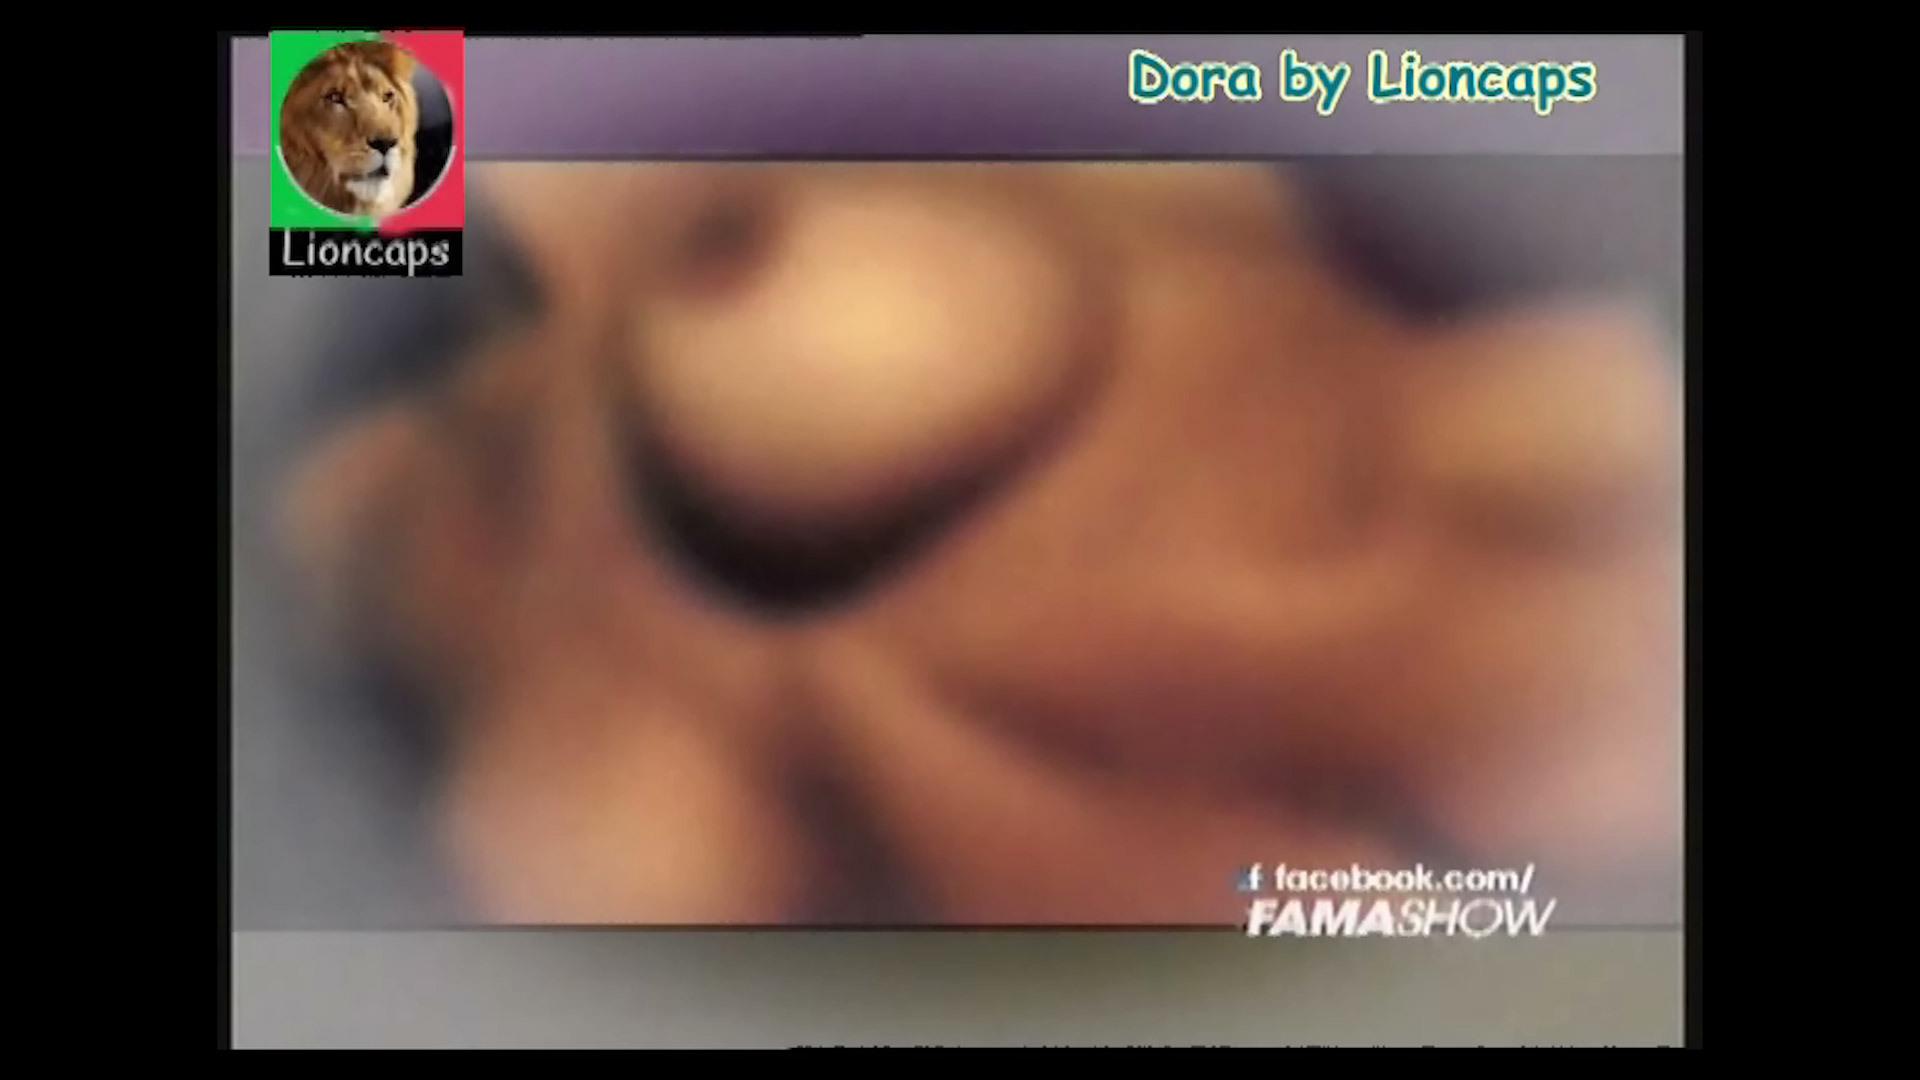 bestoff_portugal_d18_lioncaps_03_06_2021 (2).jpg